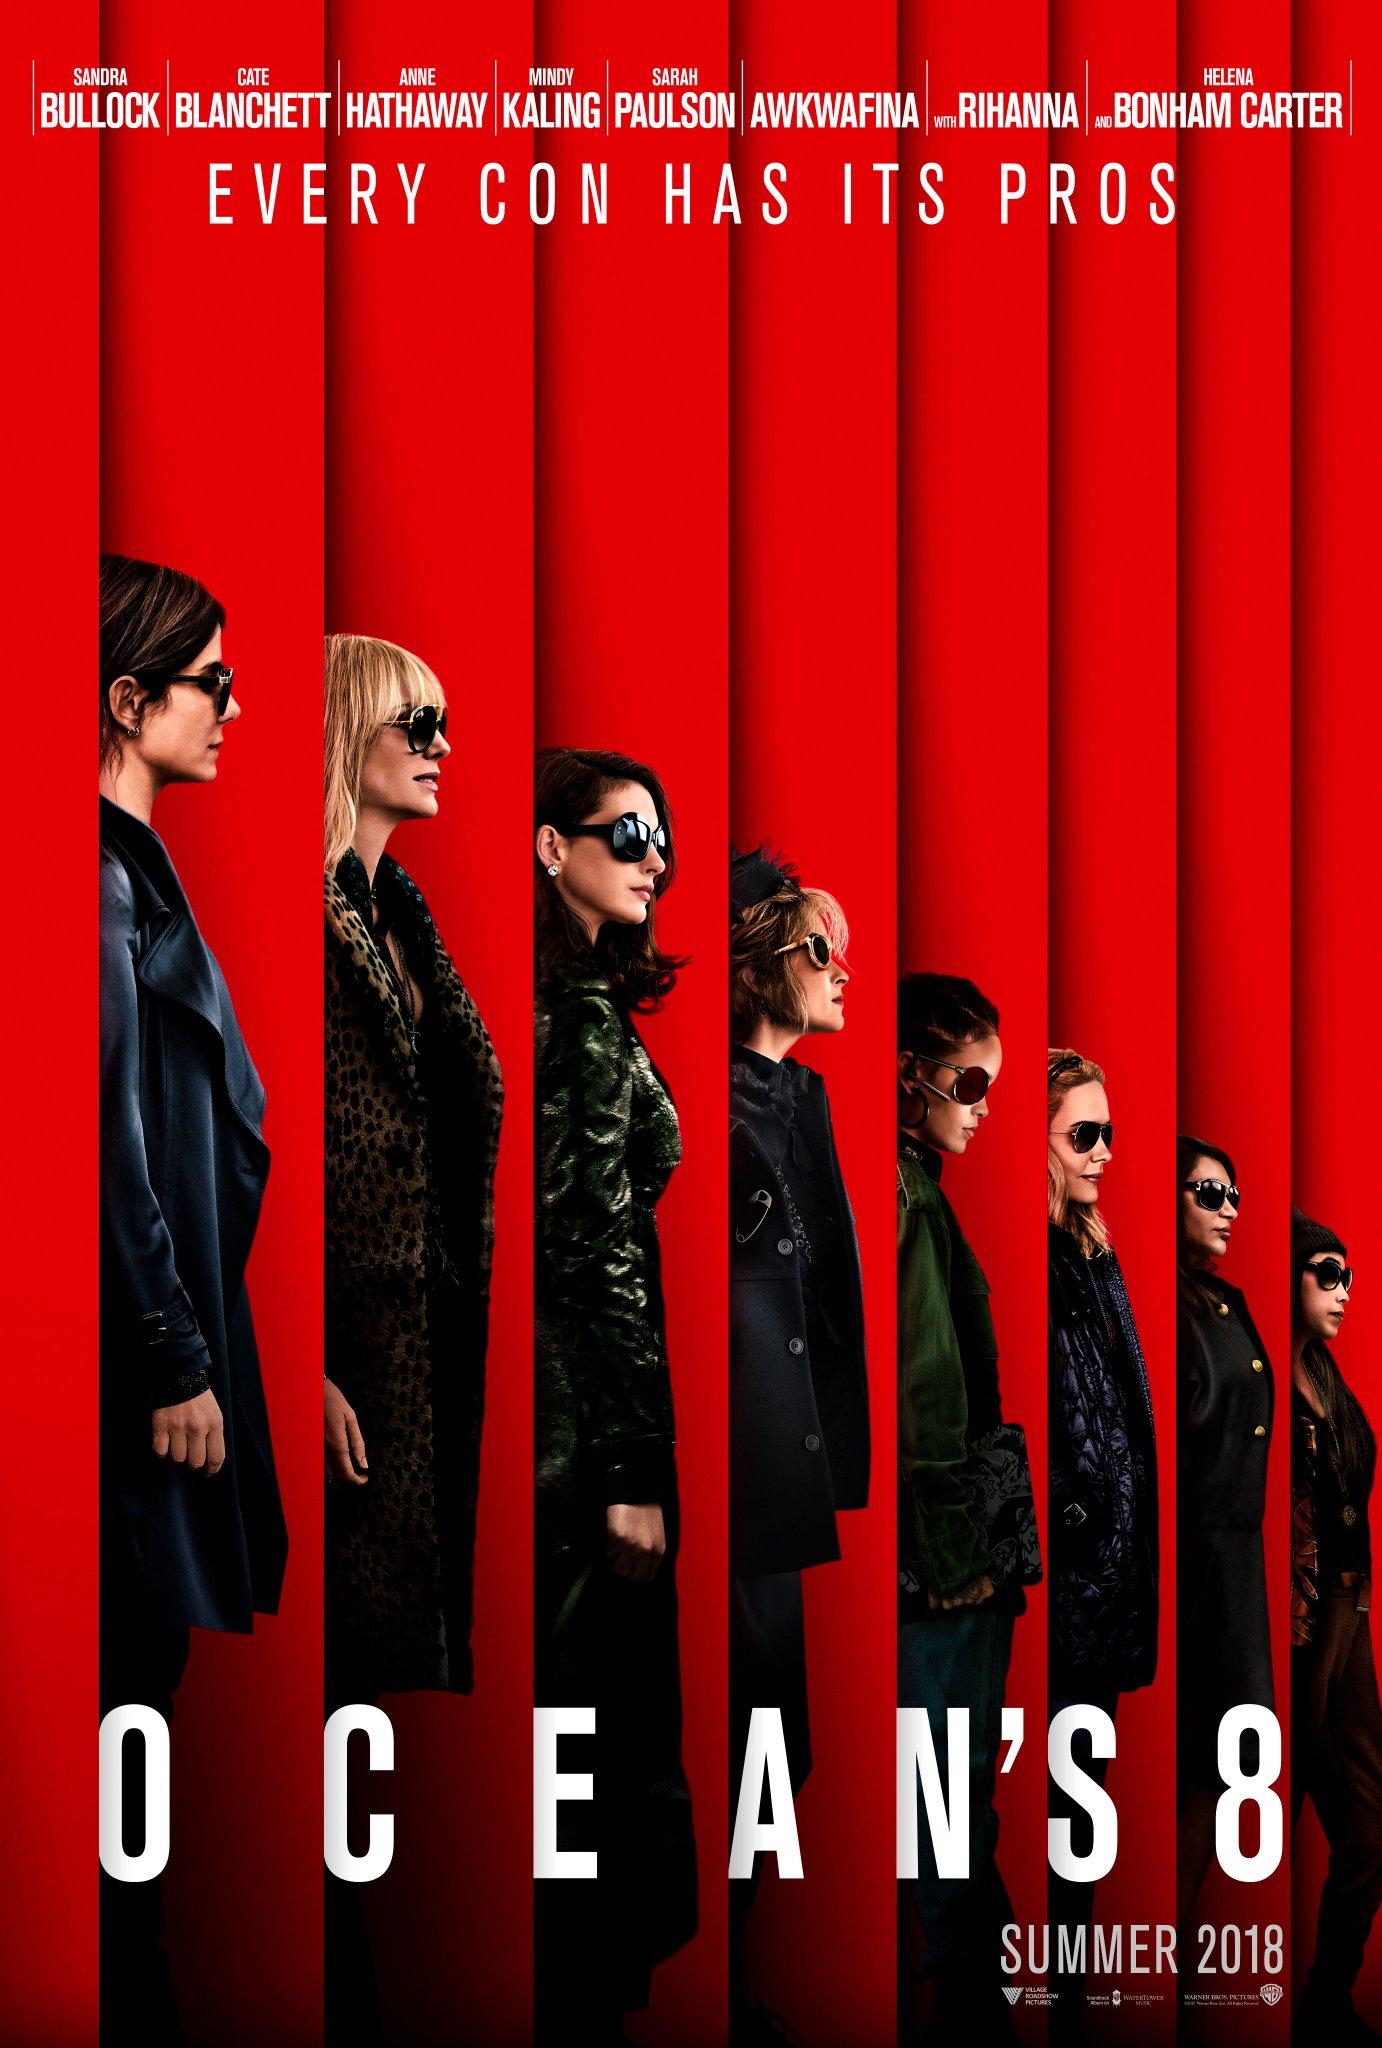 ocean's eight, ocean's 8, poster, Sandra Bullock, Cate Blanchett, Anne Hathaway, Rihanna, Helena Bonham Carter, Mindy Kaling, Awkwafina, Sarah Paulson